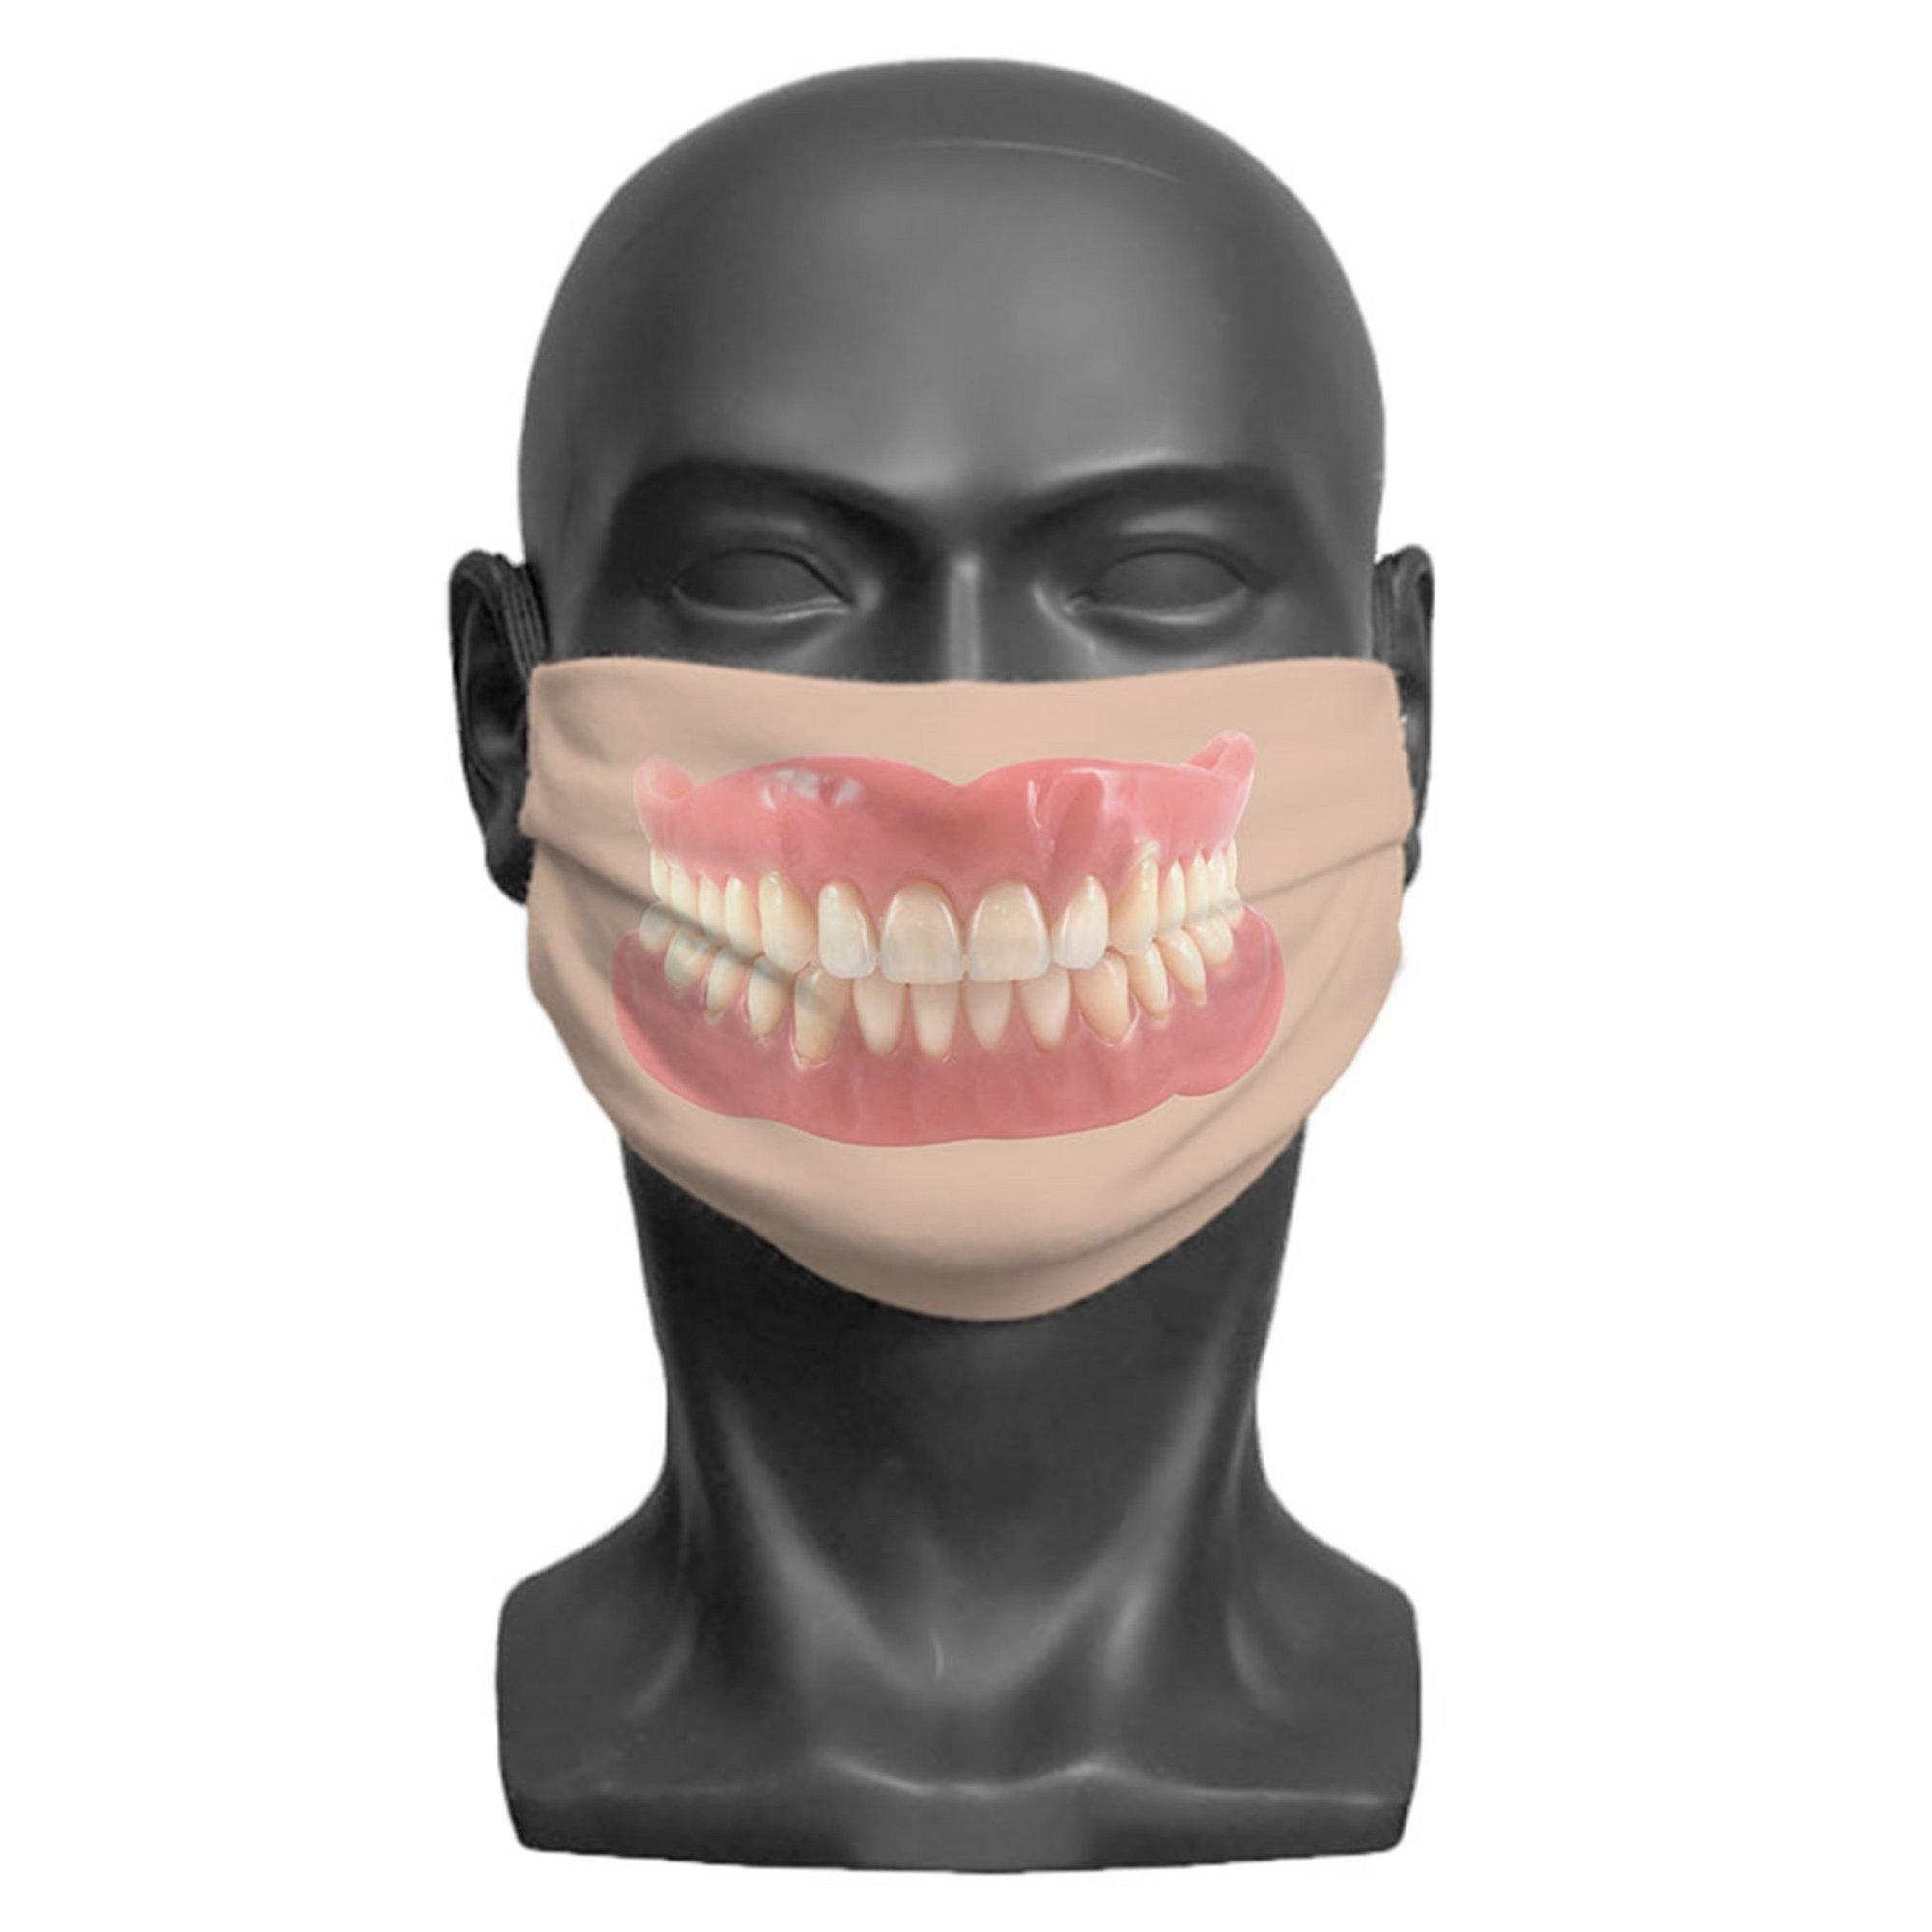 Image of Adult False Teeth Print Face Mask